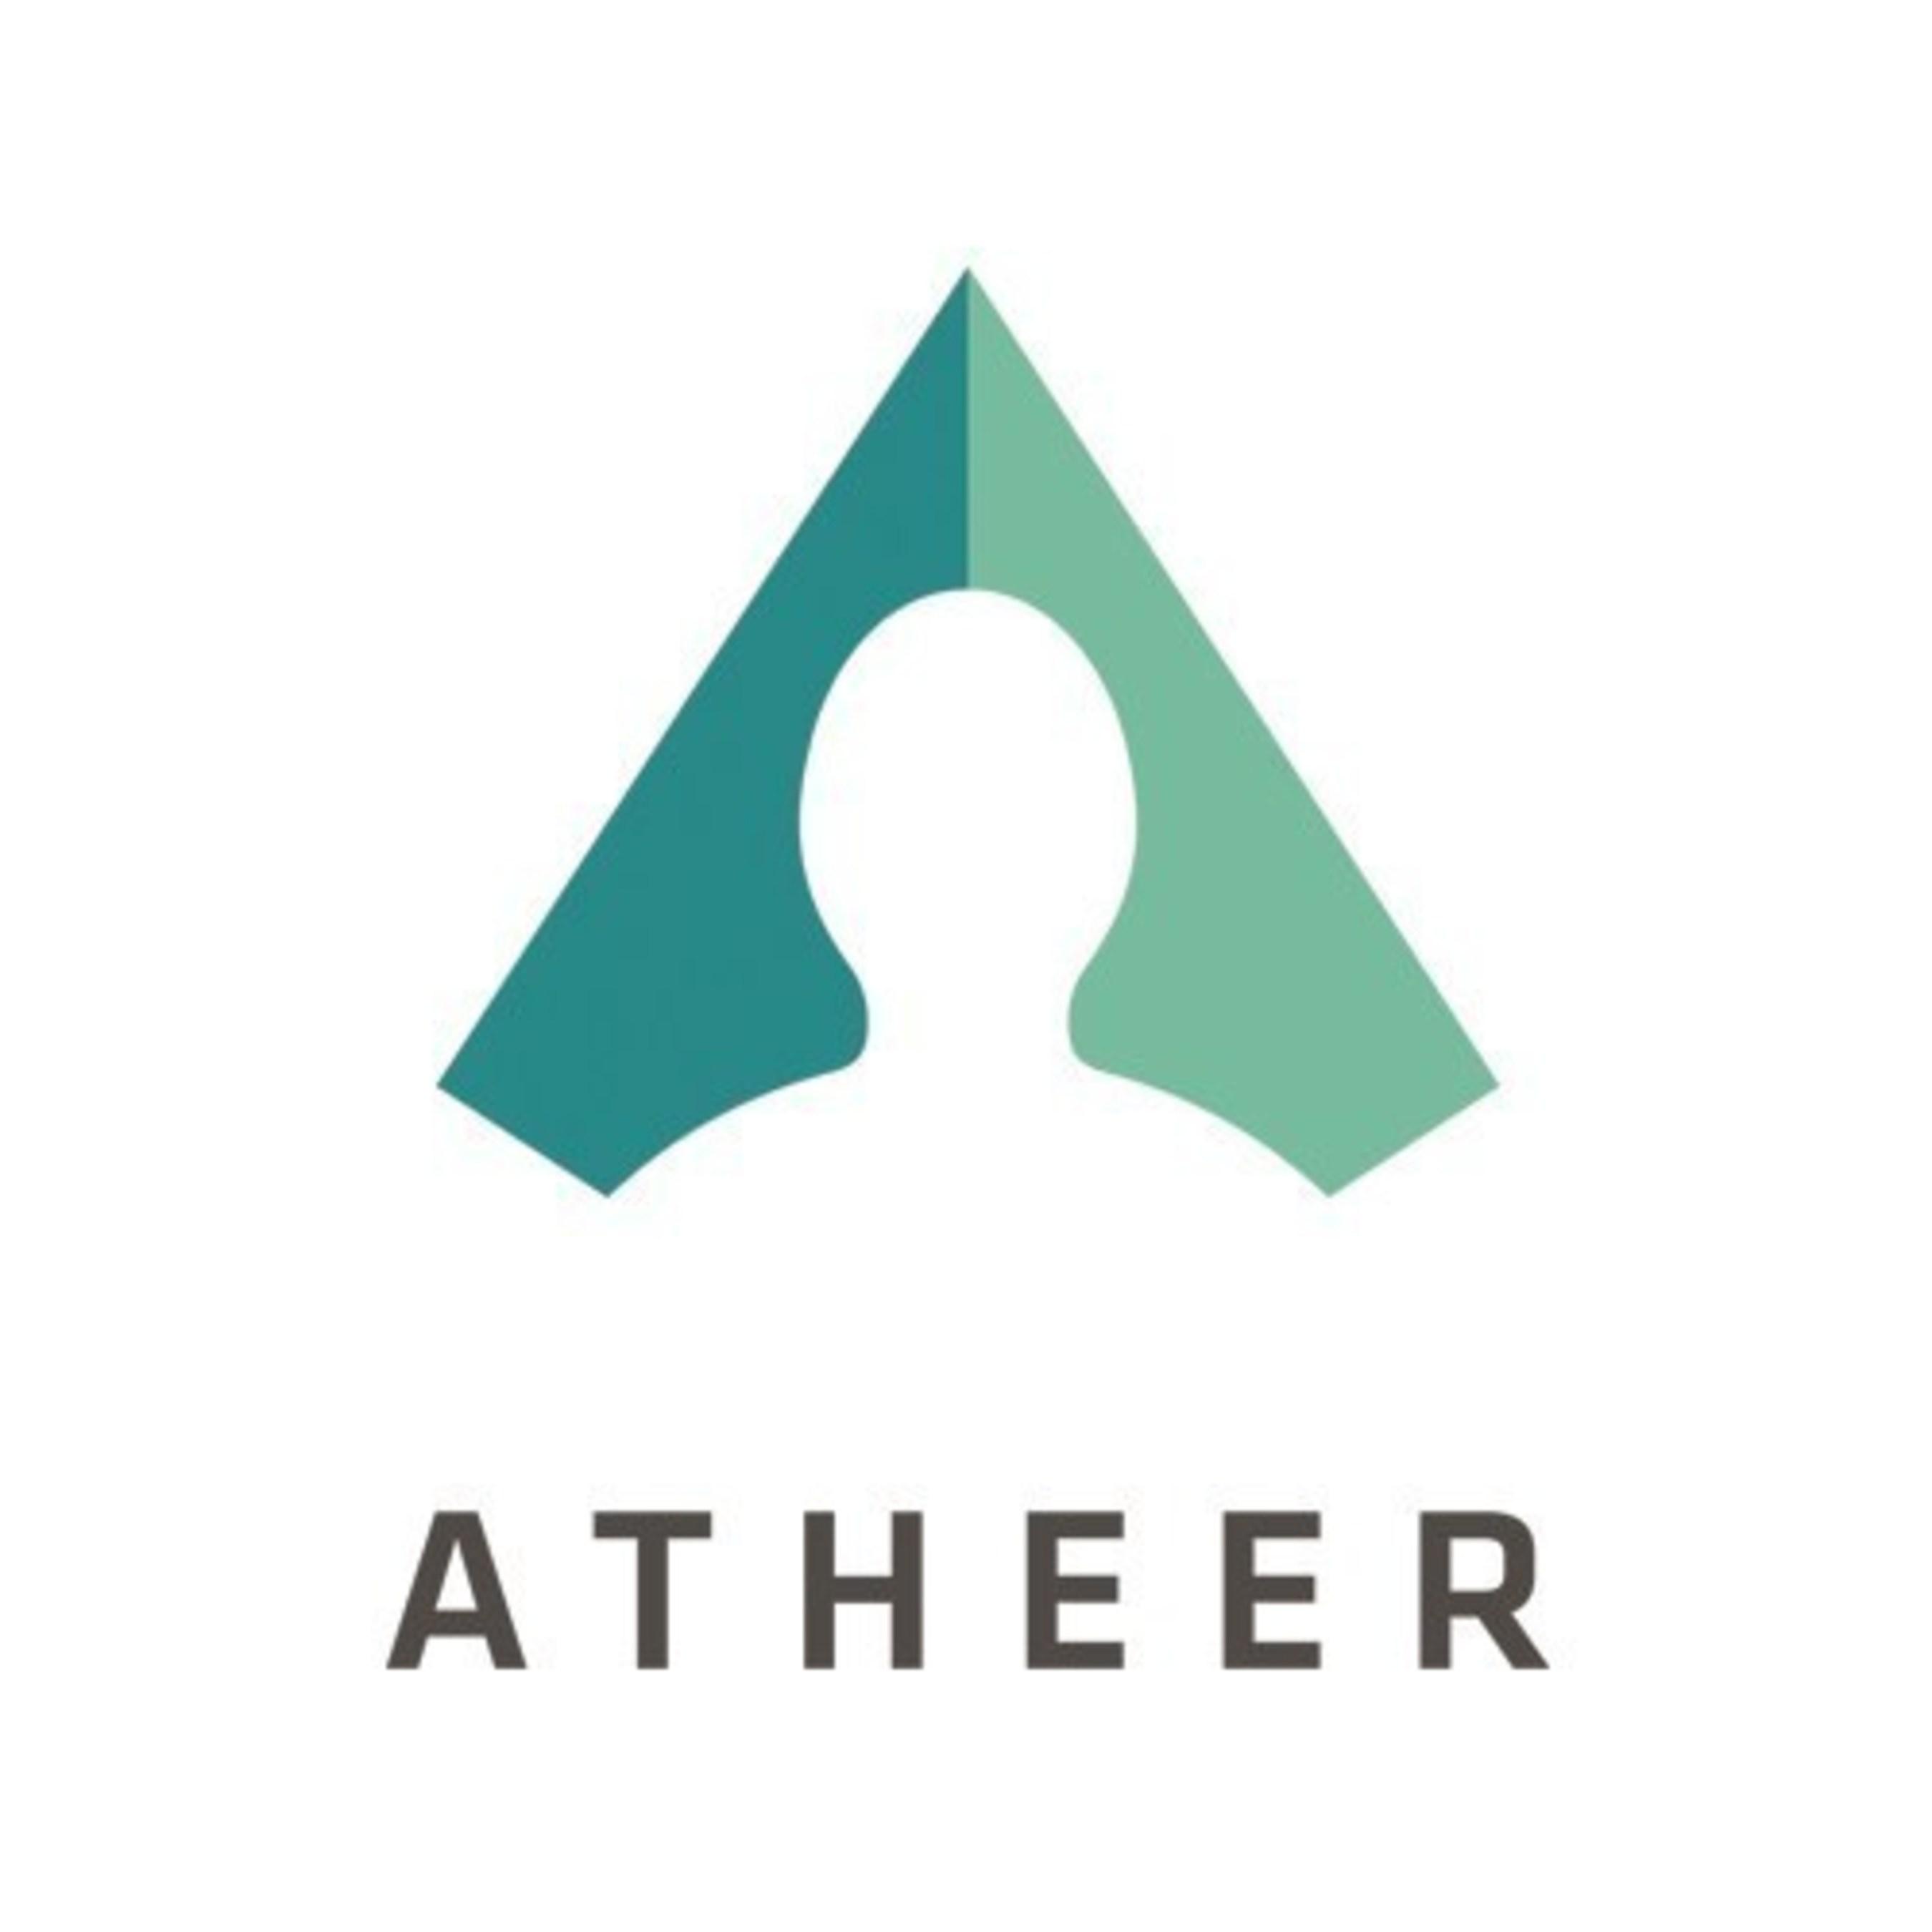 https://www.pma.org/public/new_york_new_jersey/images/Atheer-logo.jpg